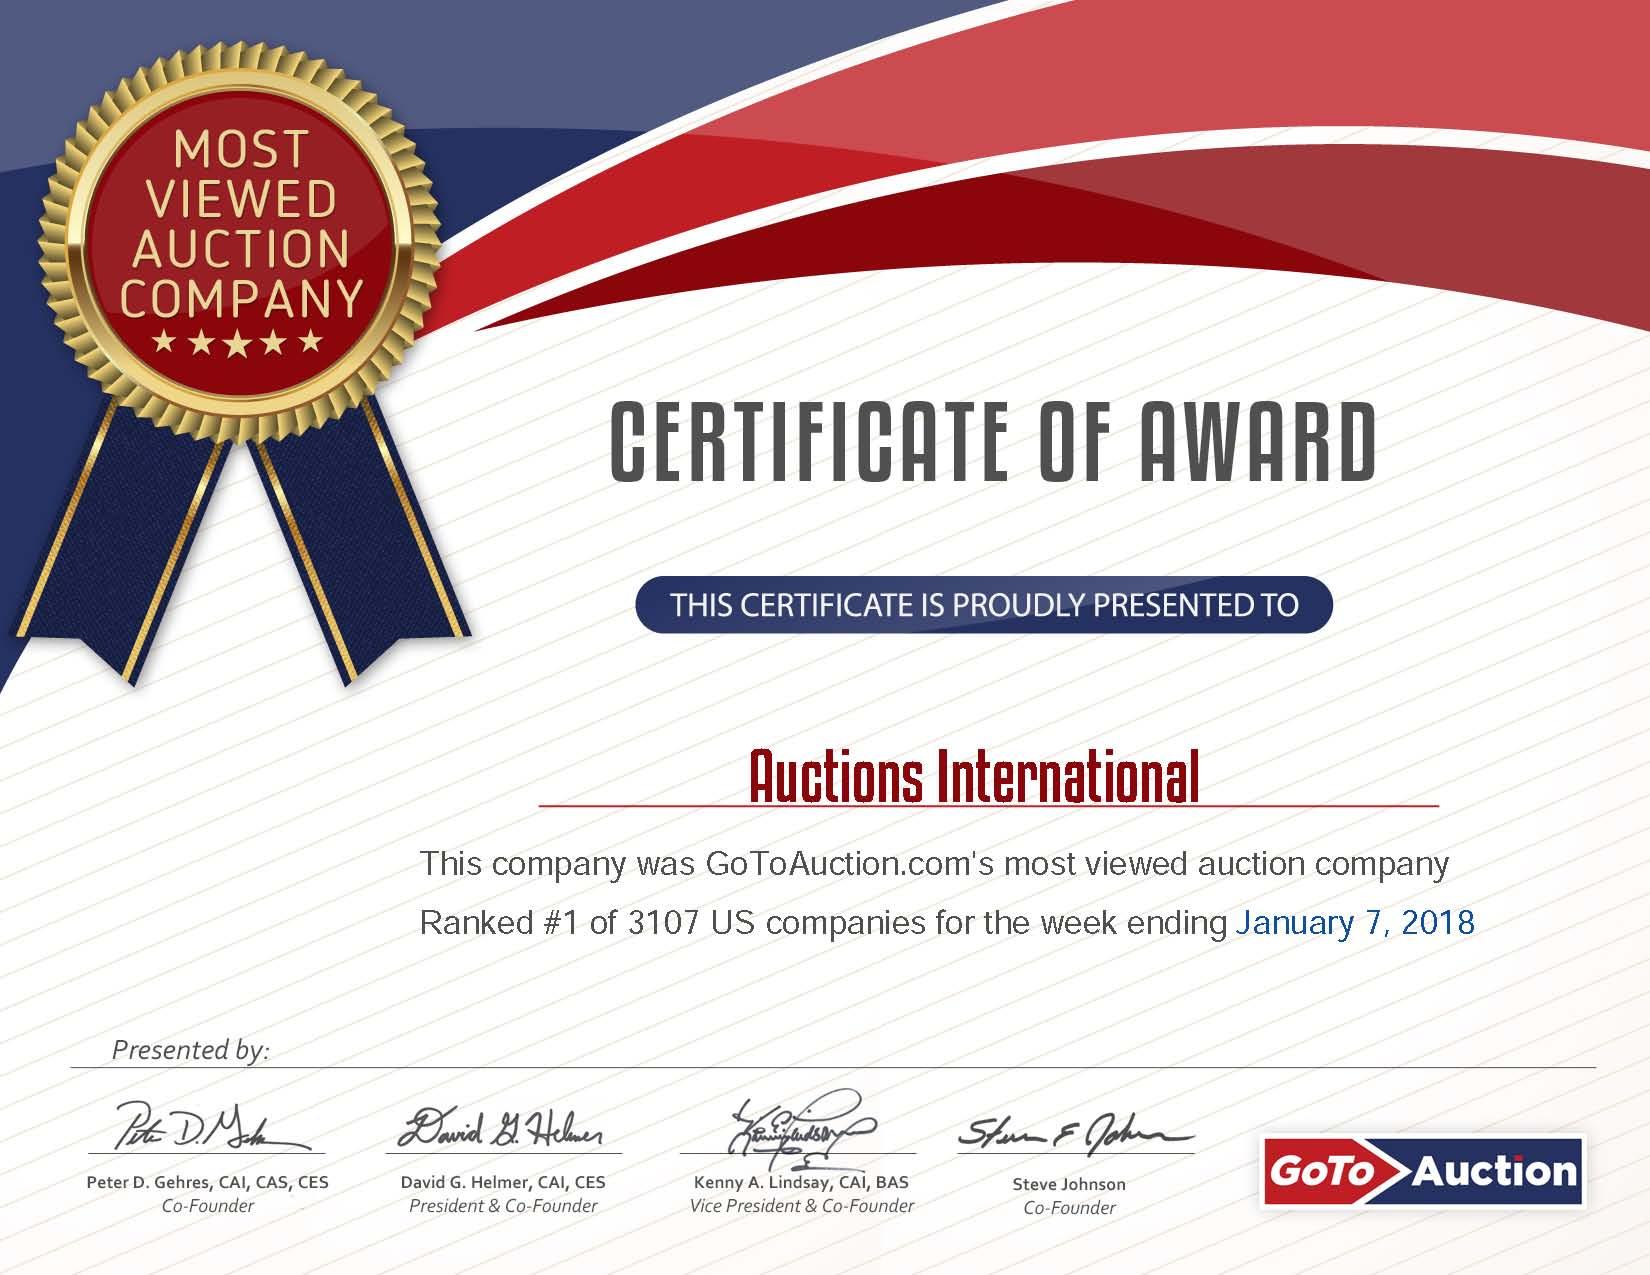 GoToAuction 1.7.2018 USA